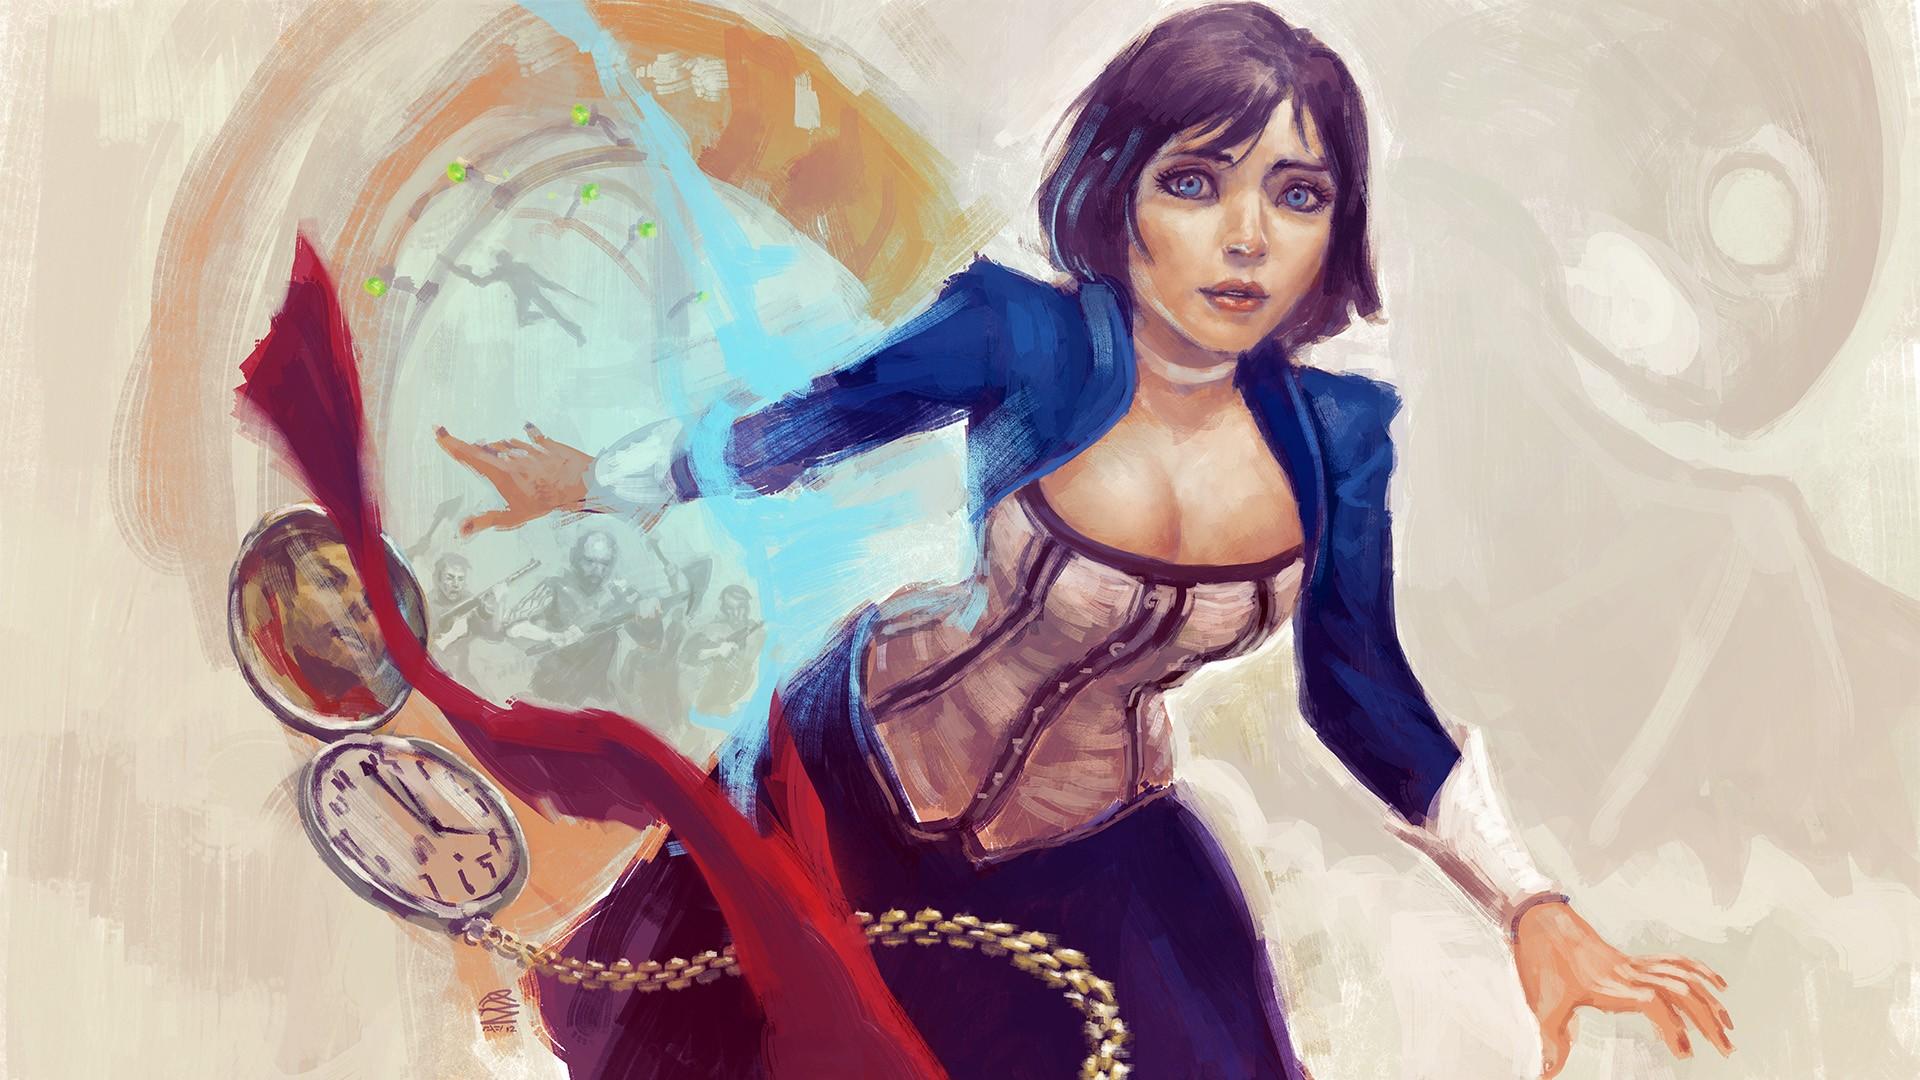 Арт к игре BioShock Infinite